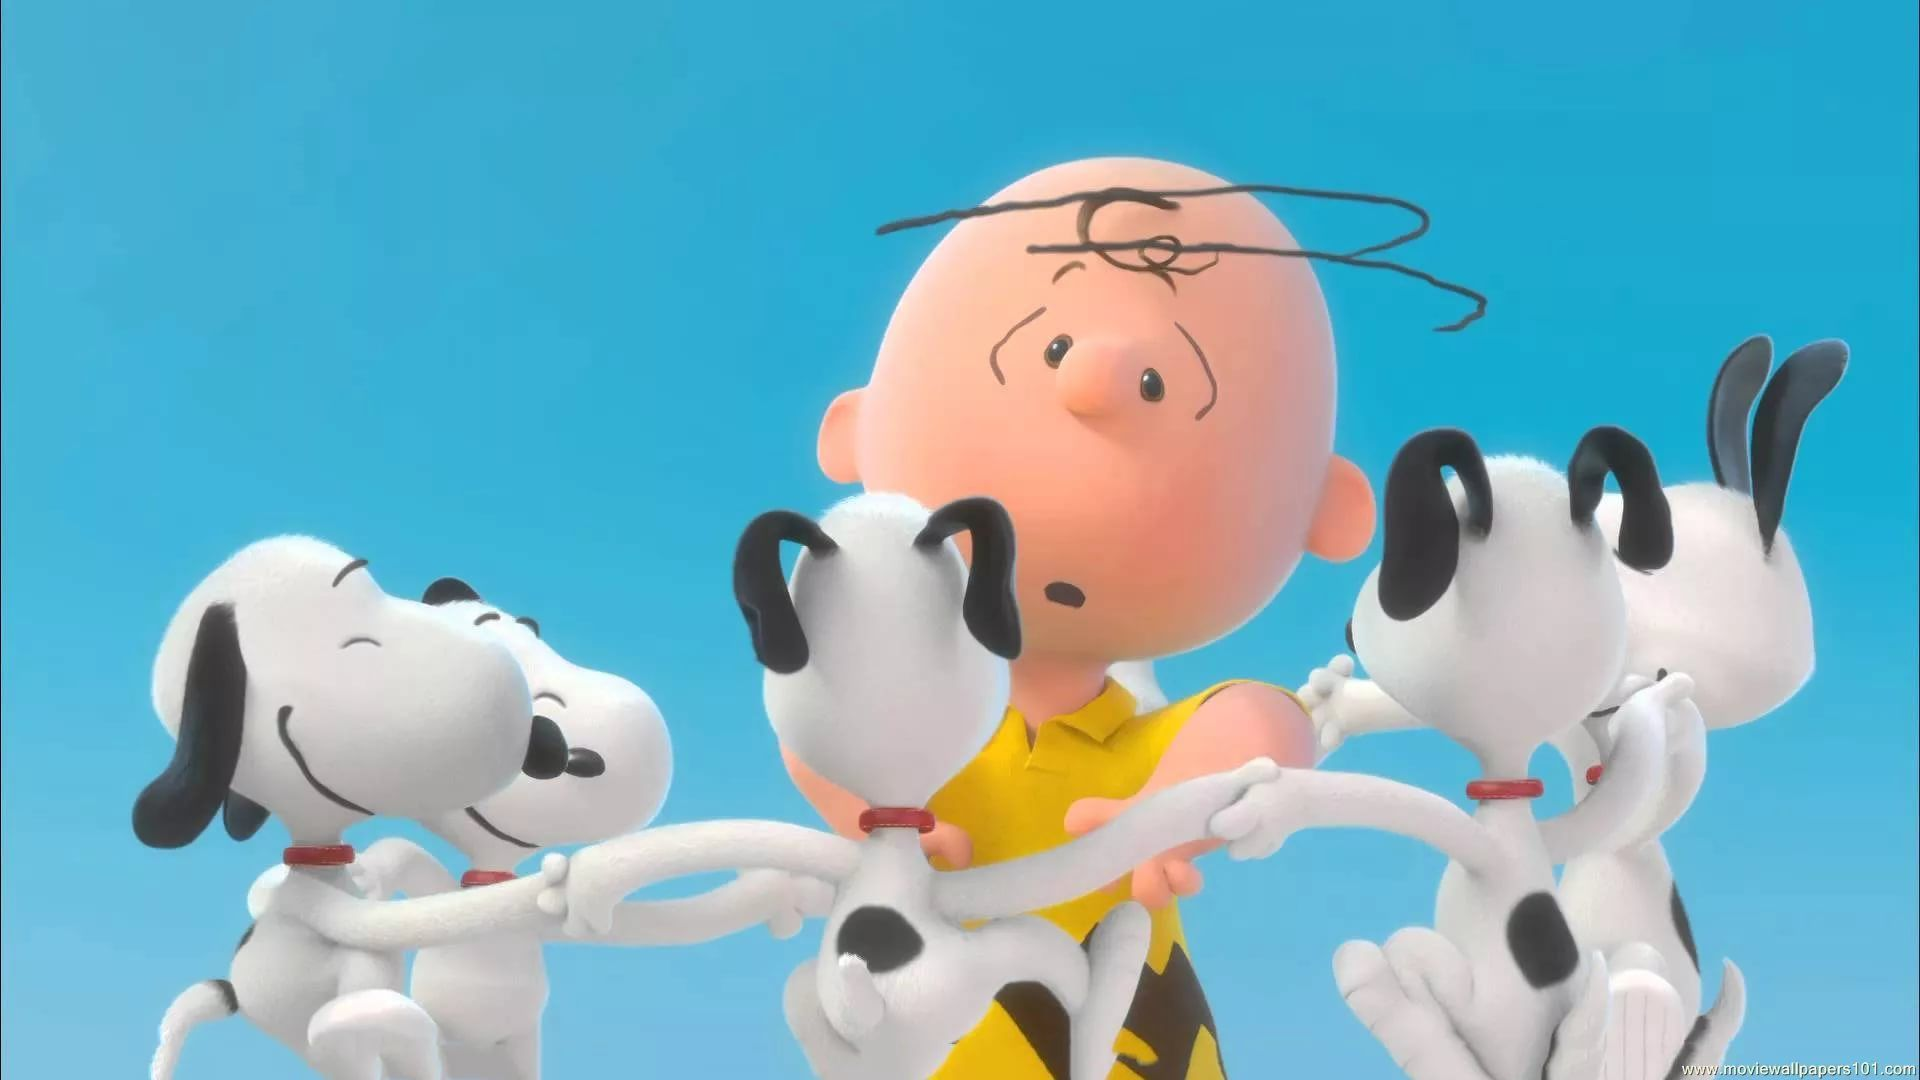 Peanuts Free Desktop Wallpaper